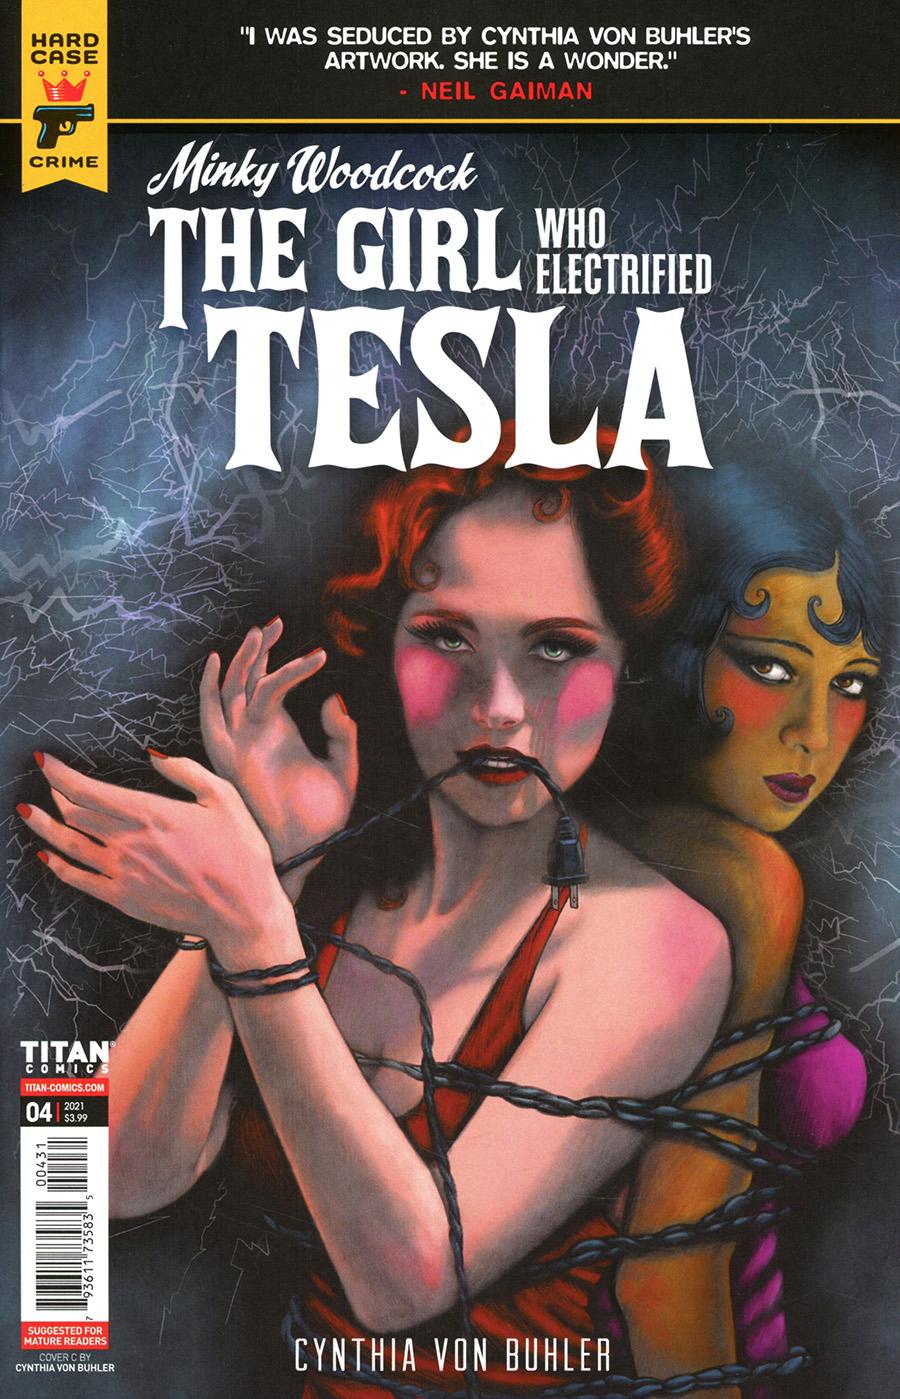 Hard Case Crime Minky Woodcock Girl Who Electrified Tesla #4 Cover C Variant Cynthia von Buhler Cover